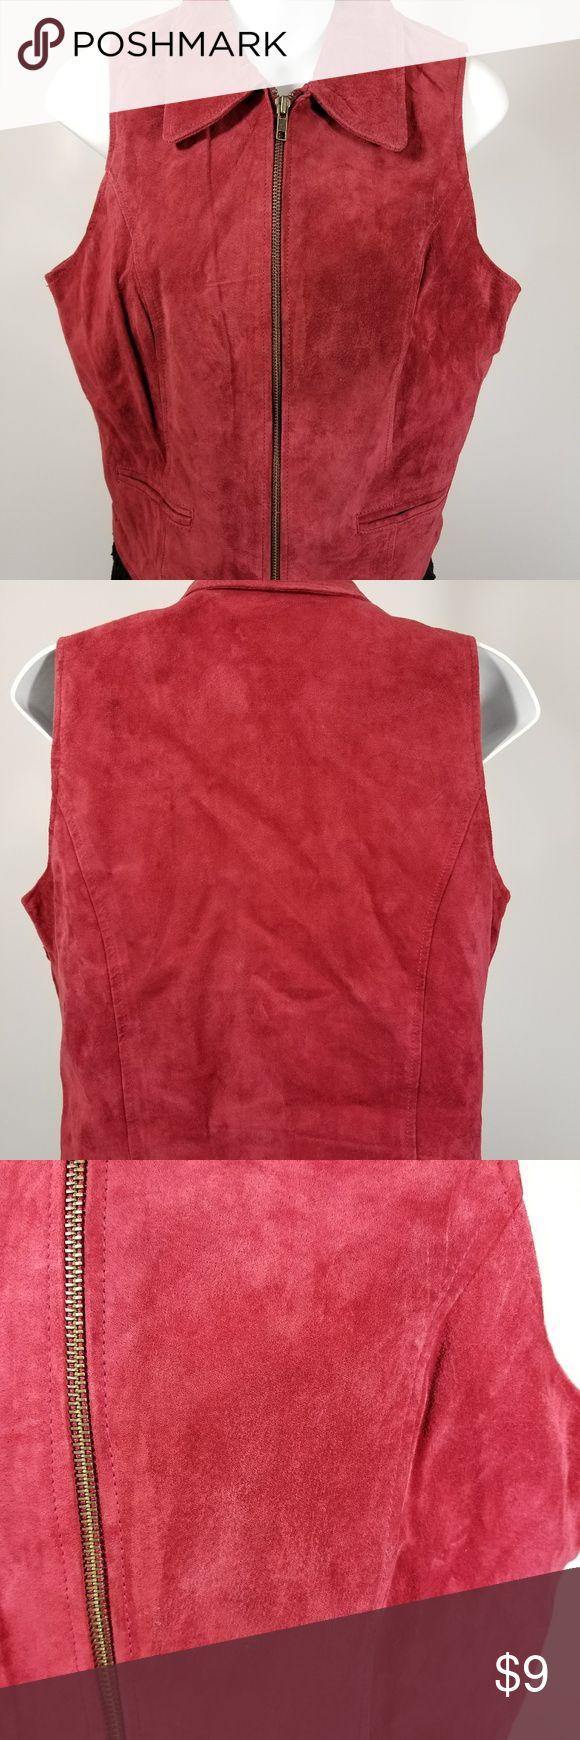 "Hunt Club Women Suede Red Vest Zipper Closure Hunt Club Women Suede Red Vest Zipper Closure some discoloration on front Sz 8  MEASUREMENTS:  (approximate) Shoulder to hem - 20.5""  pit to pit - 18.5""  Hem Width - 17.25"" Sleeve Length - 0"" Hunt Club Jackets & Coats Vests #vestswomens"